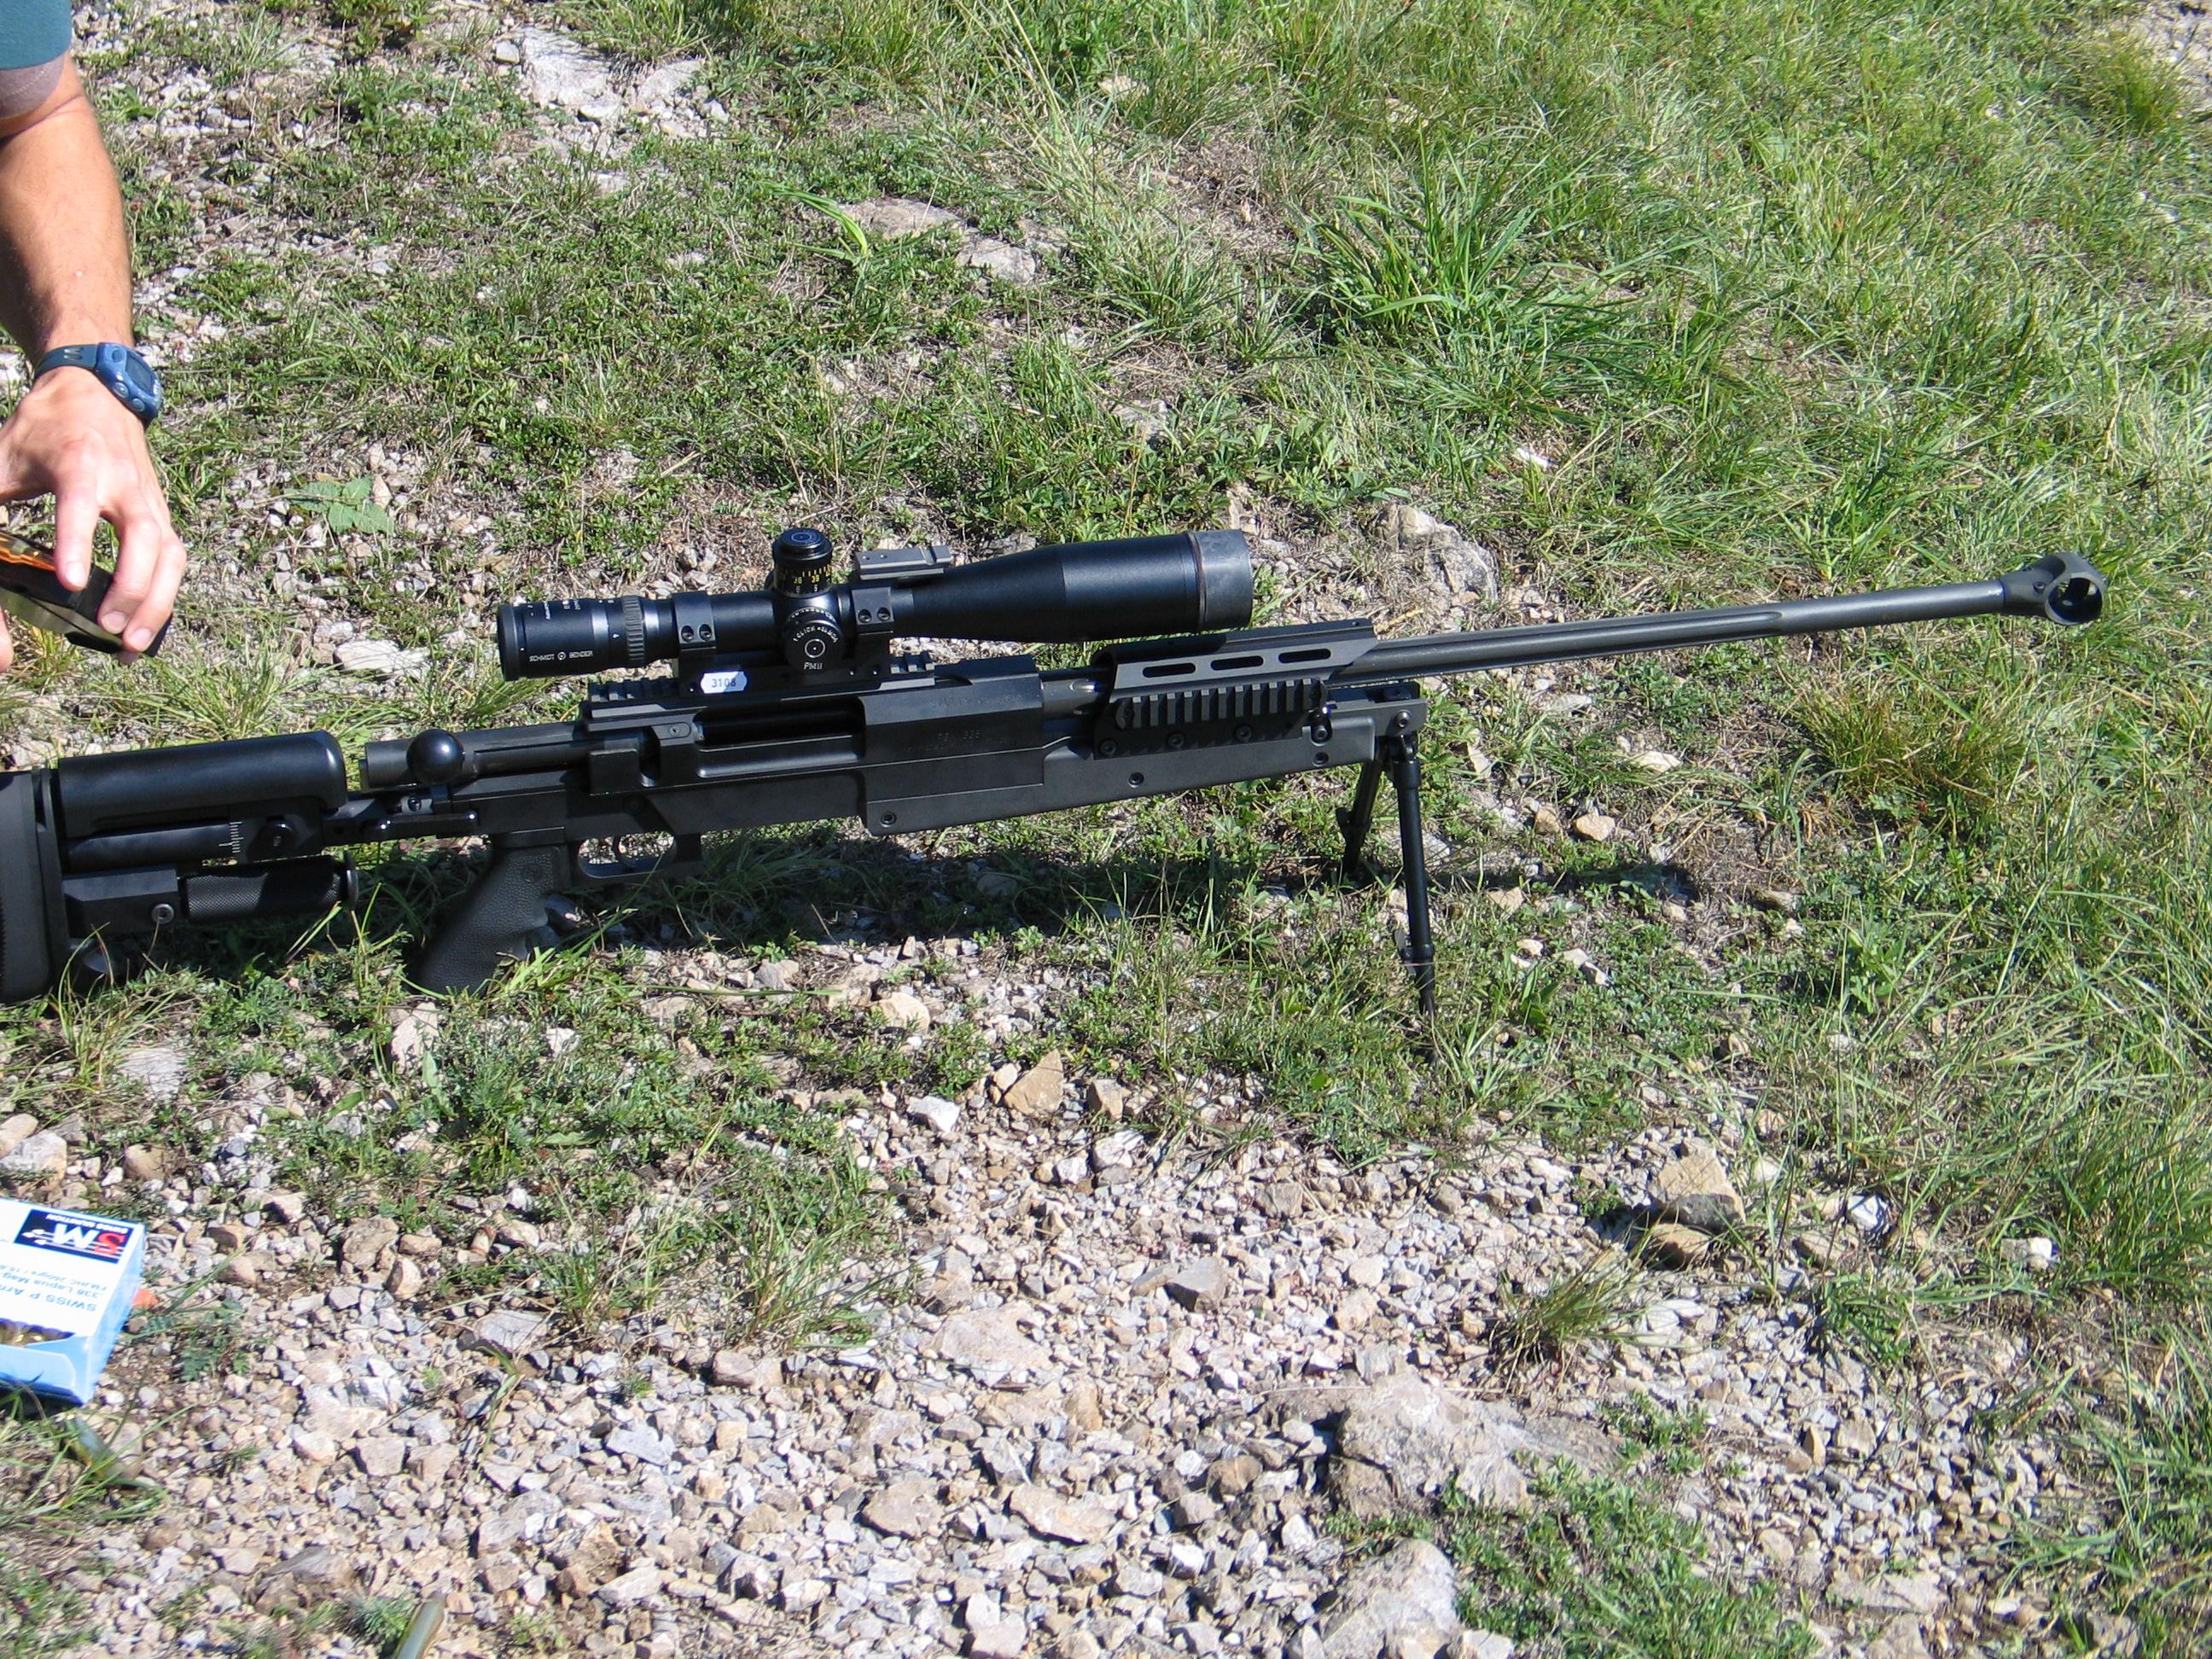 File:Mini Hecate-338 Lapua Magnum JPG - Wikimedia Commons